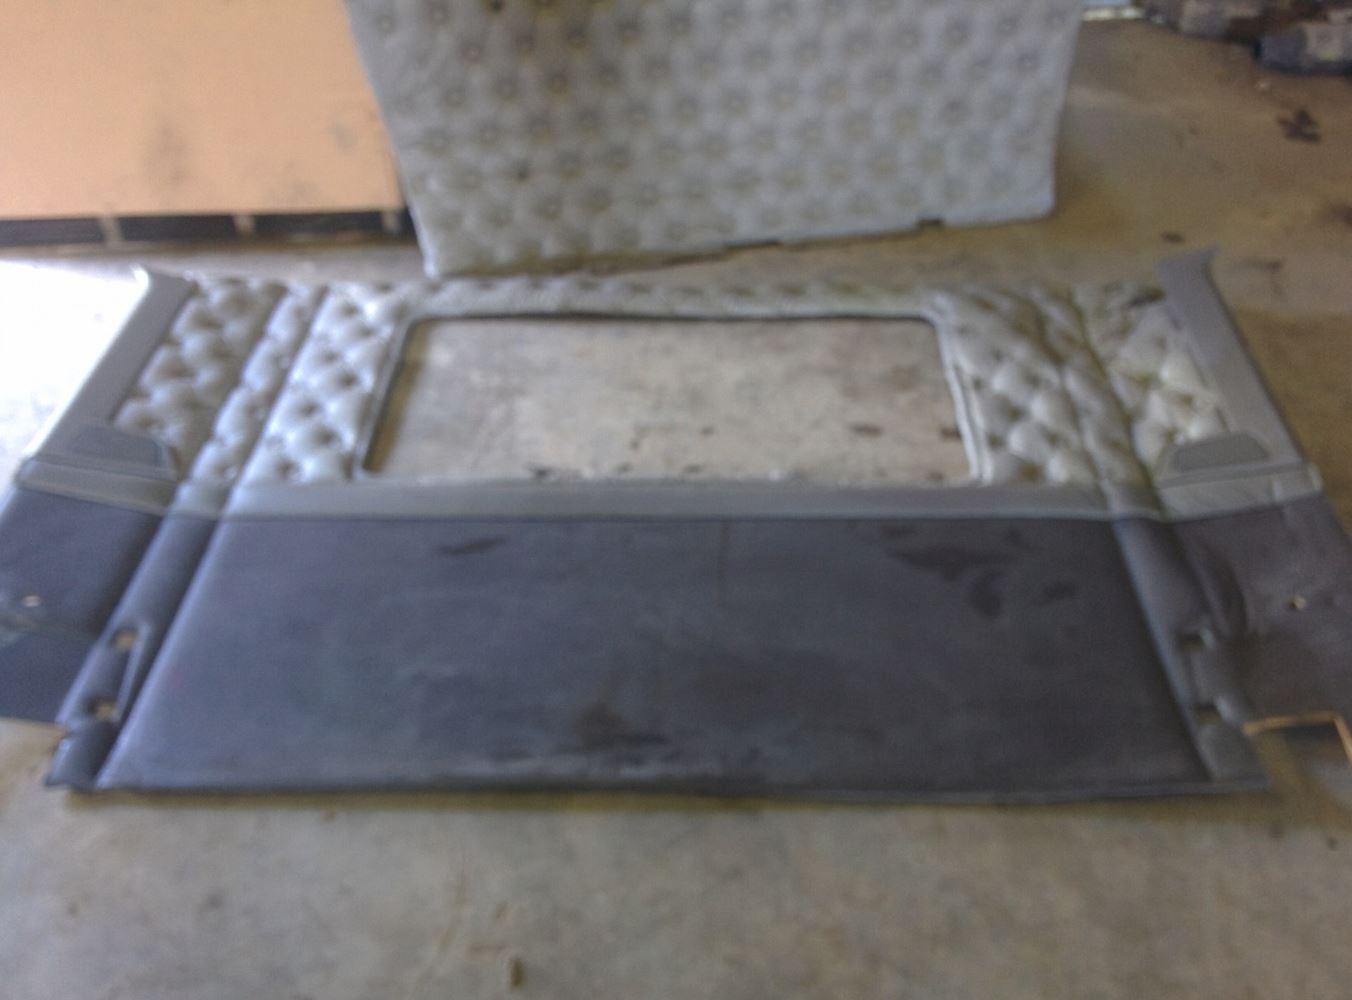 2007 Kenworth T800 (Stock #KW-0474-58) | Interior Misc Parts | TPI